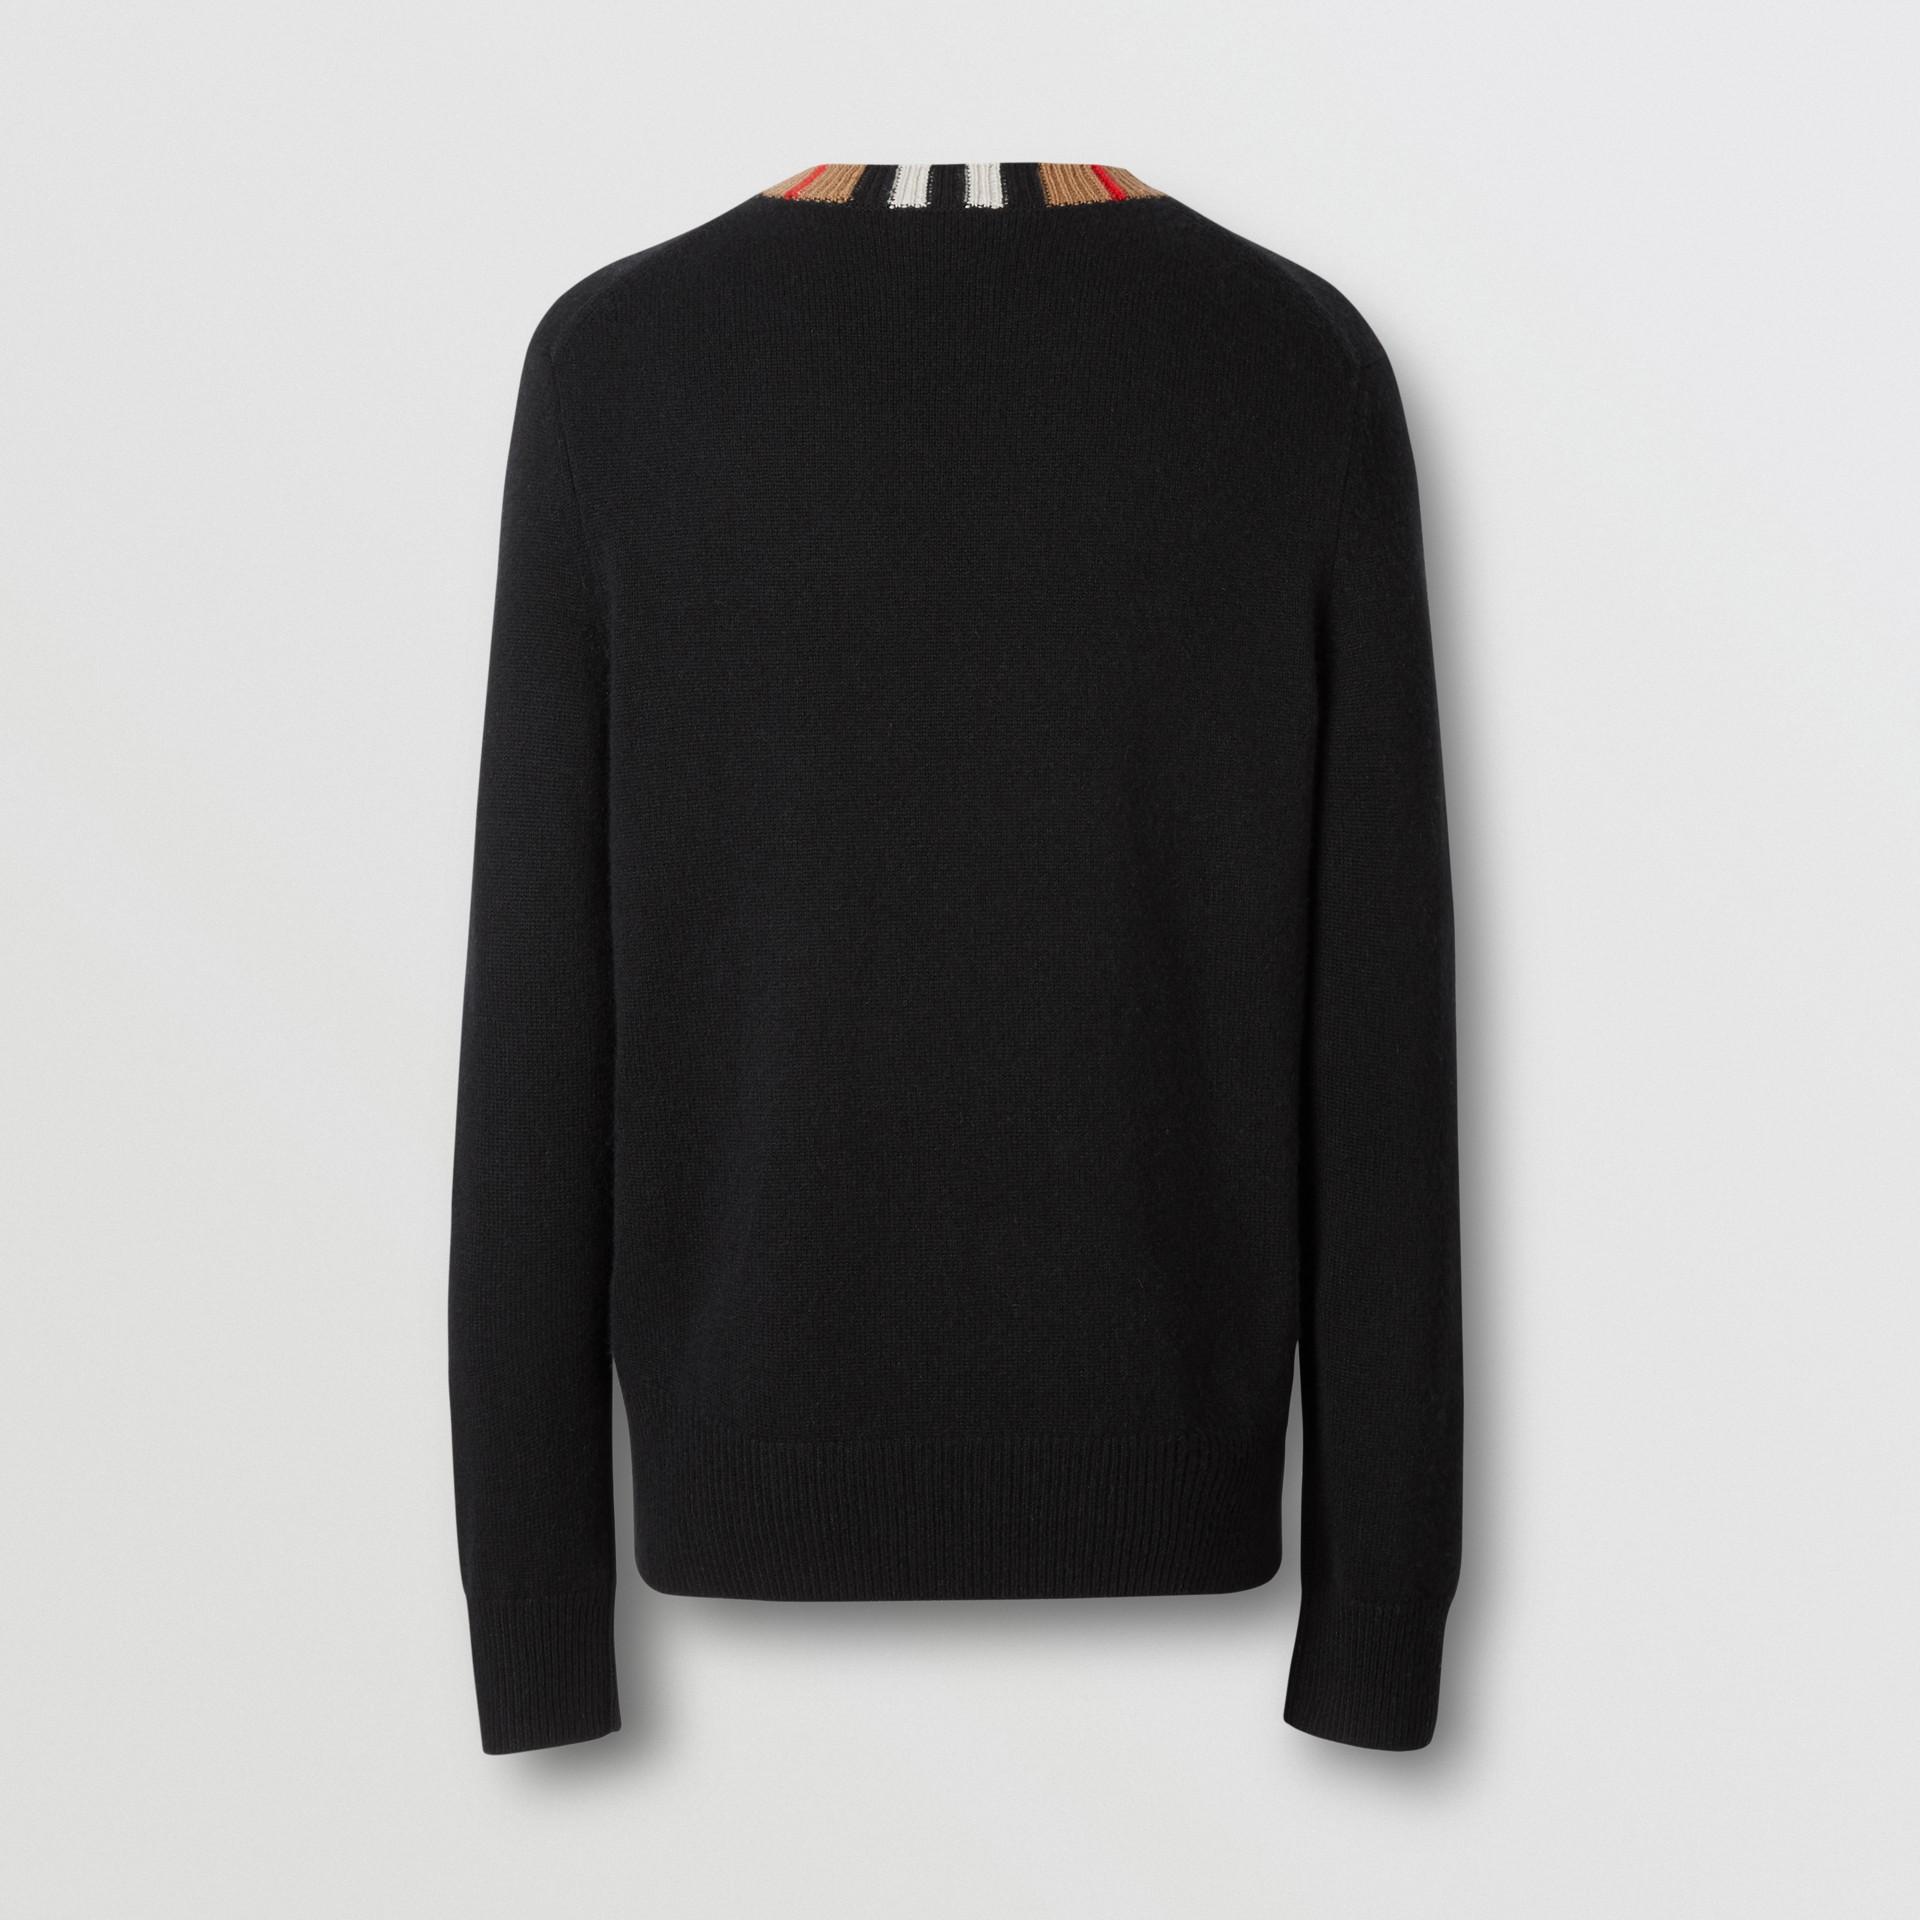 Icon Stripe Trim Cashmere Sweater in Black - Men | Burberry - gallery image 6